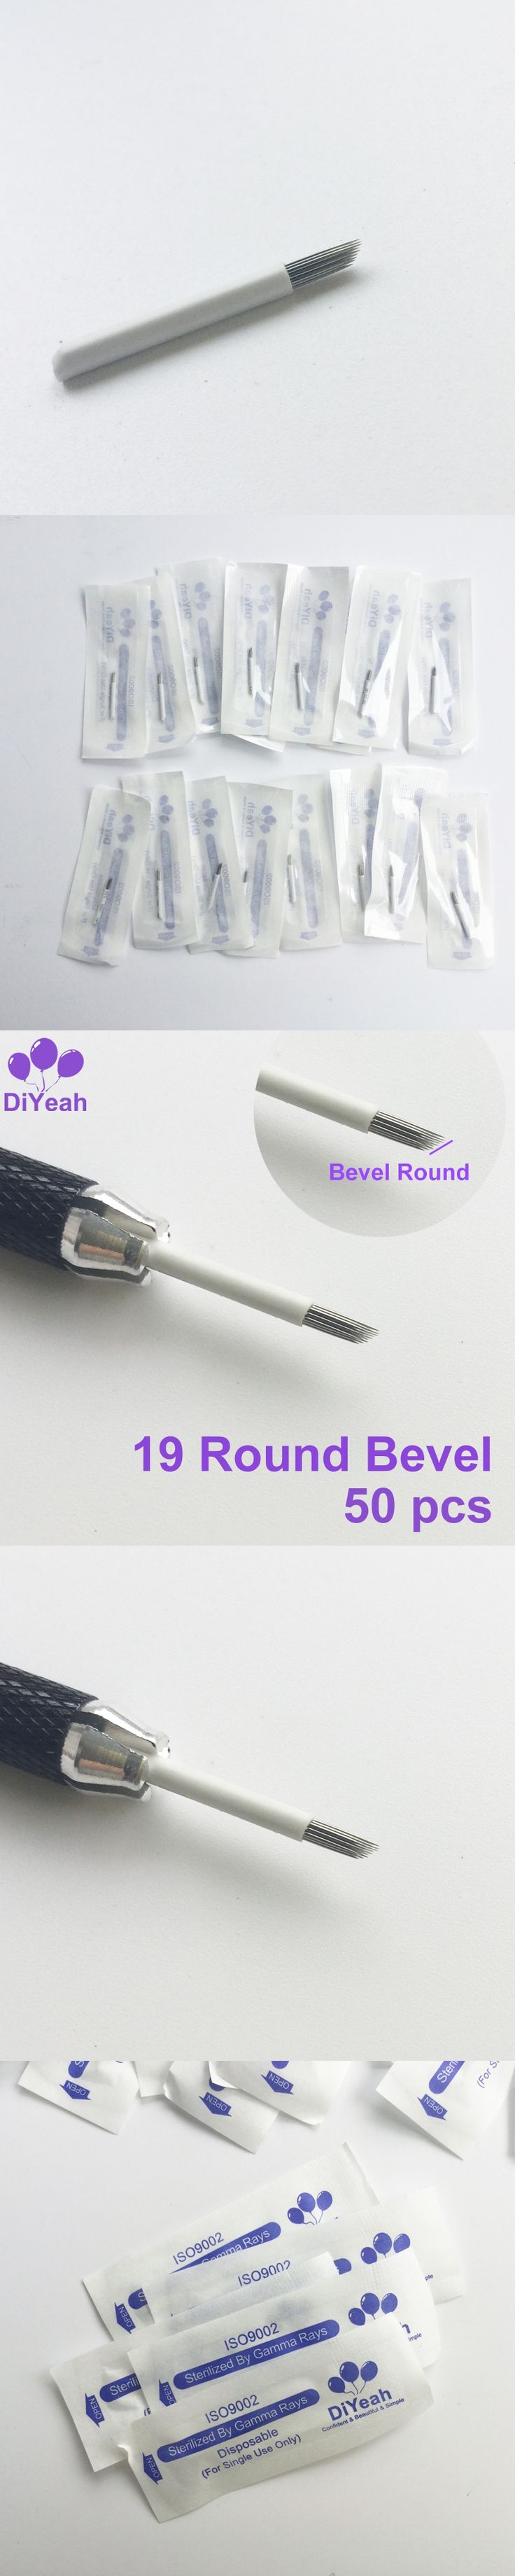 50pcs 19 Round Bevel Needles for Manual Pen Semi Permanent Makeup Fog Pen Needle R19 Microblading Eyebrow Tattoo 3D Blades Tatoo